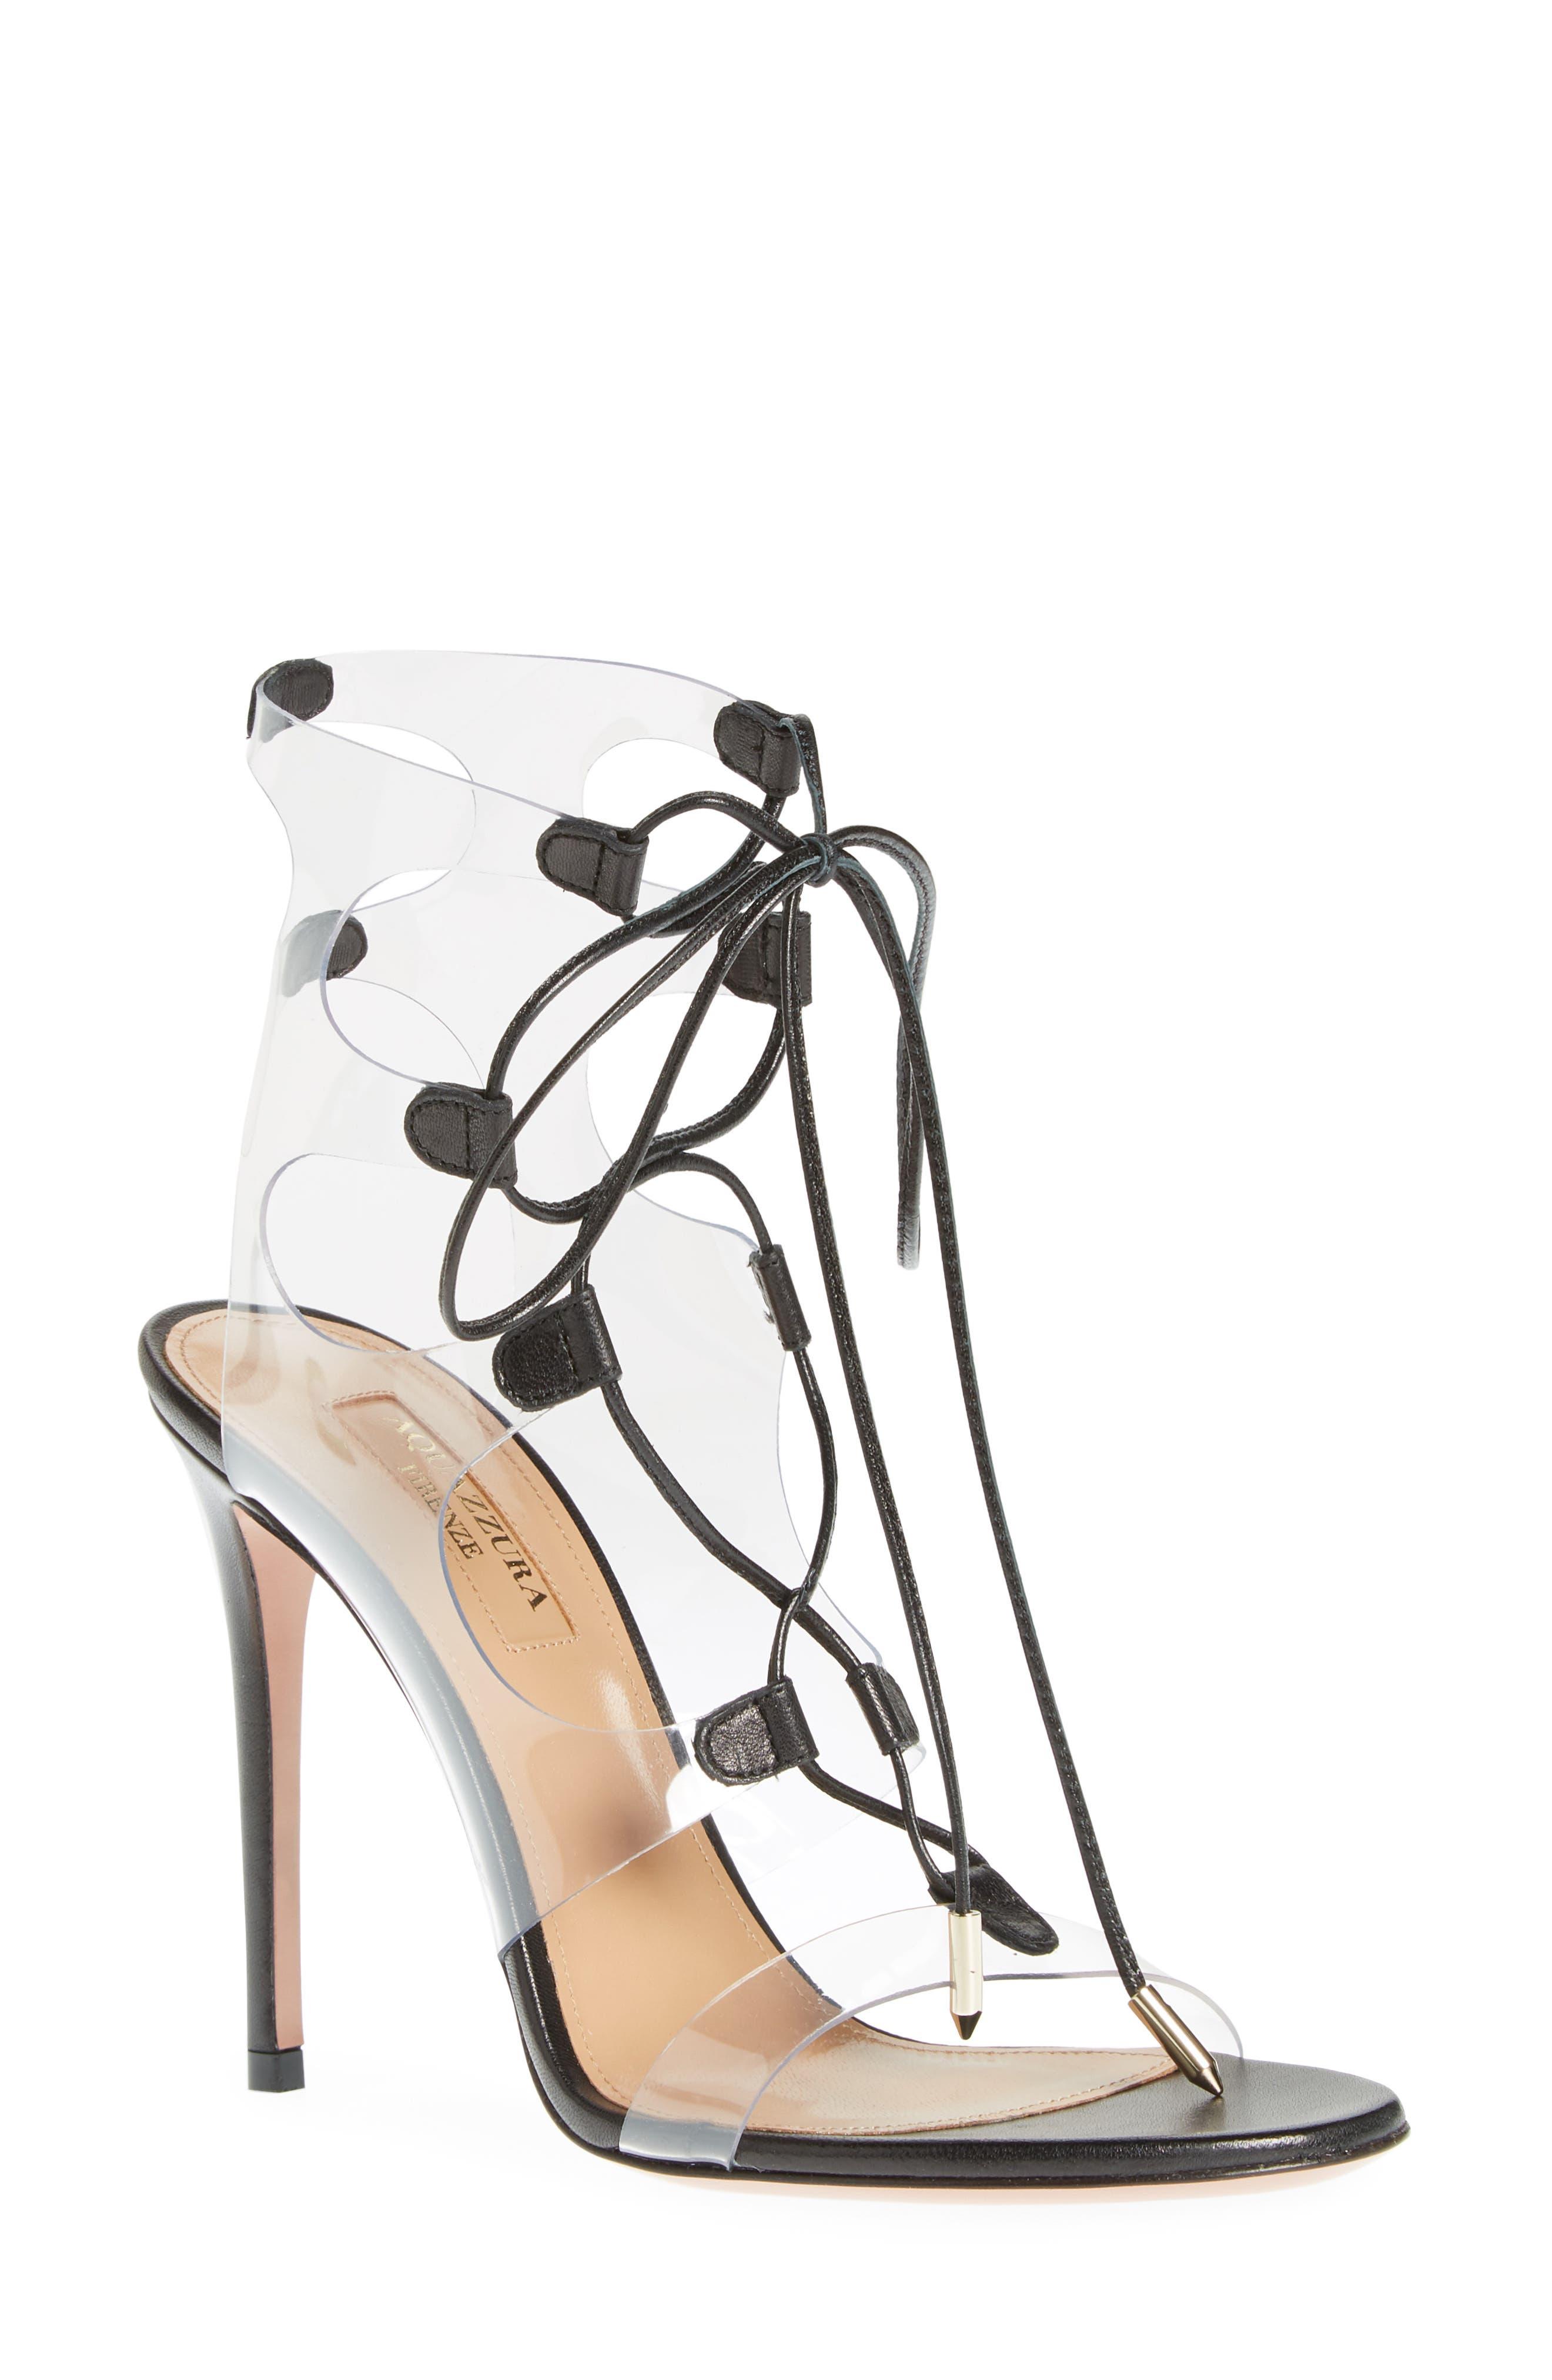 AQUAZZURA, Milos PVC Lace-Up Sandal, Main thumbnail 1, color, BLACK